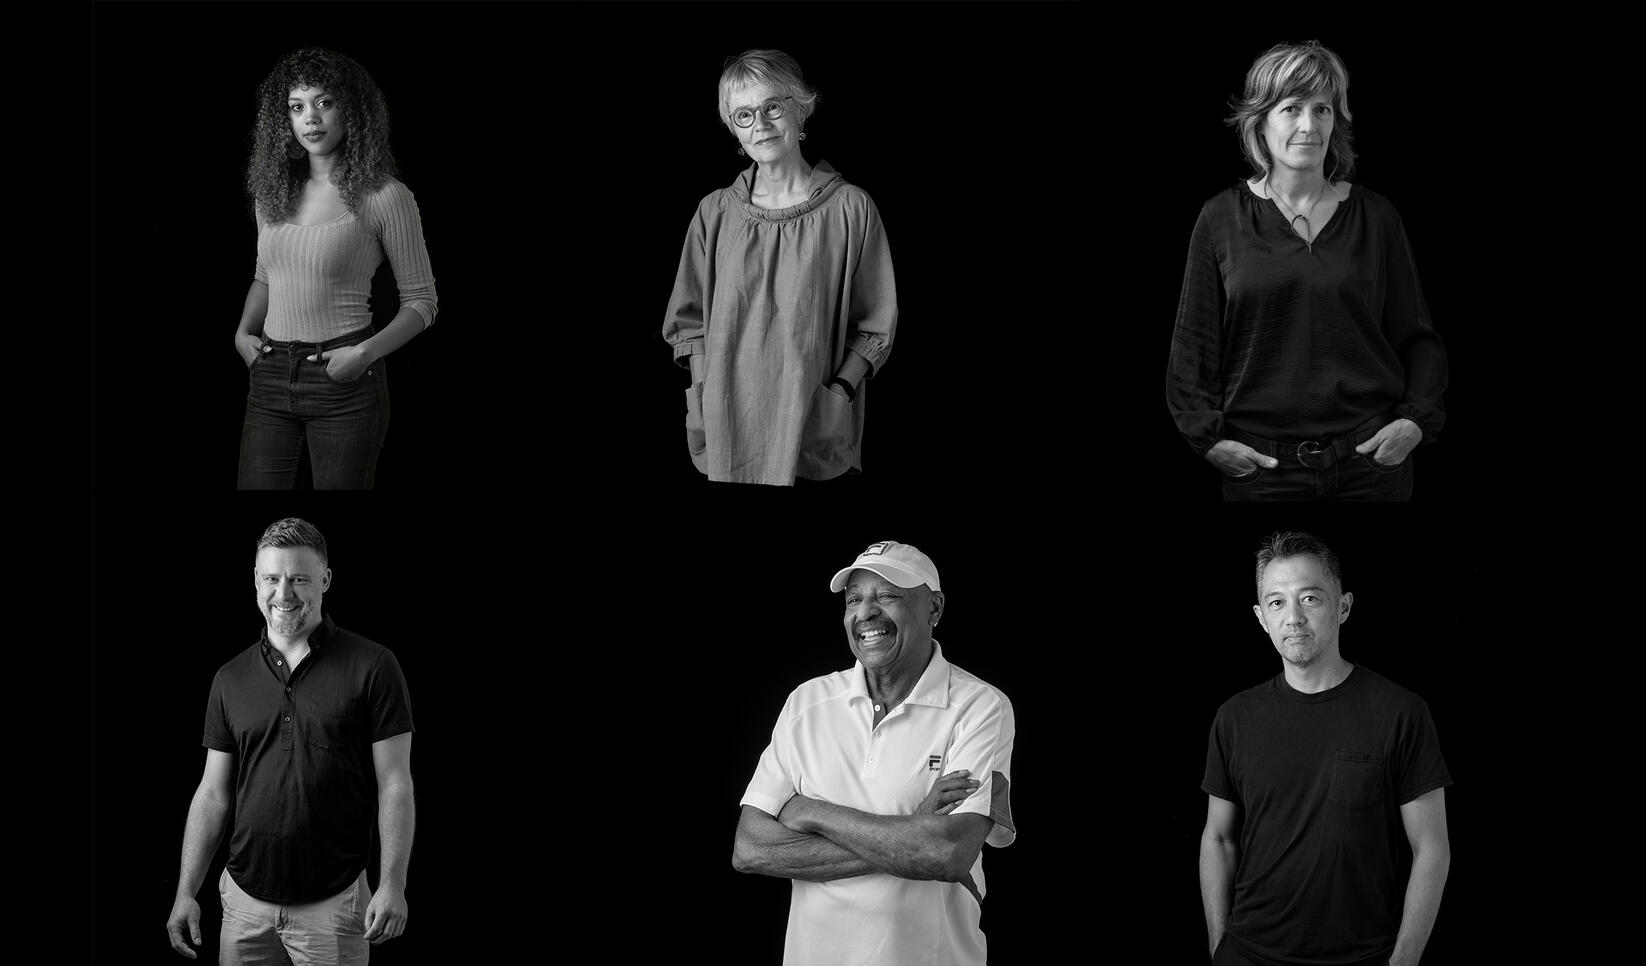 Portraits of the 2019 McKnight fellows